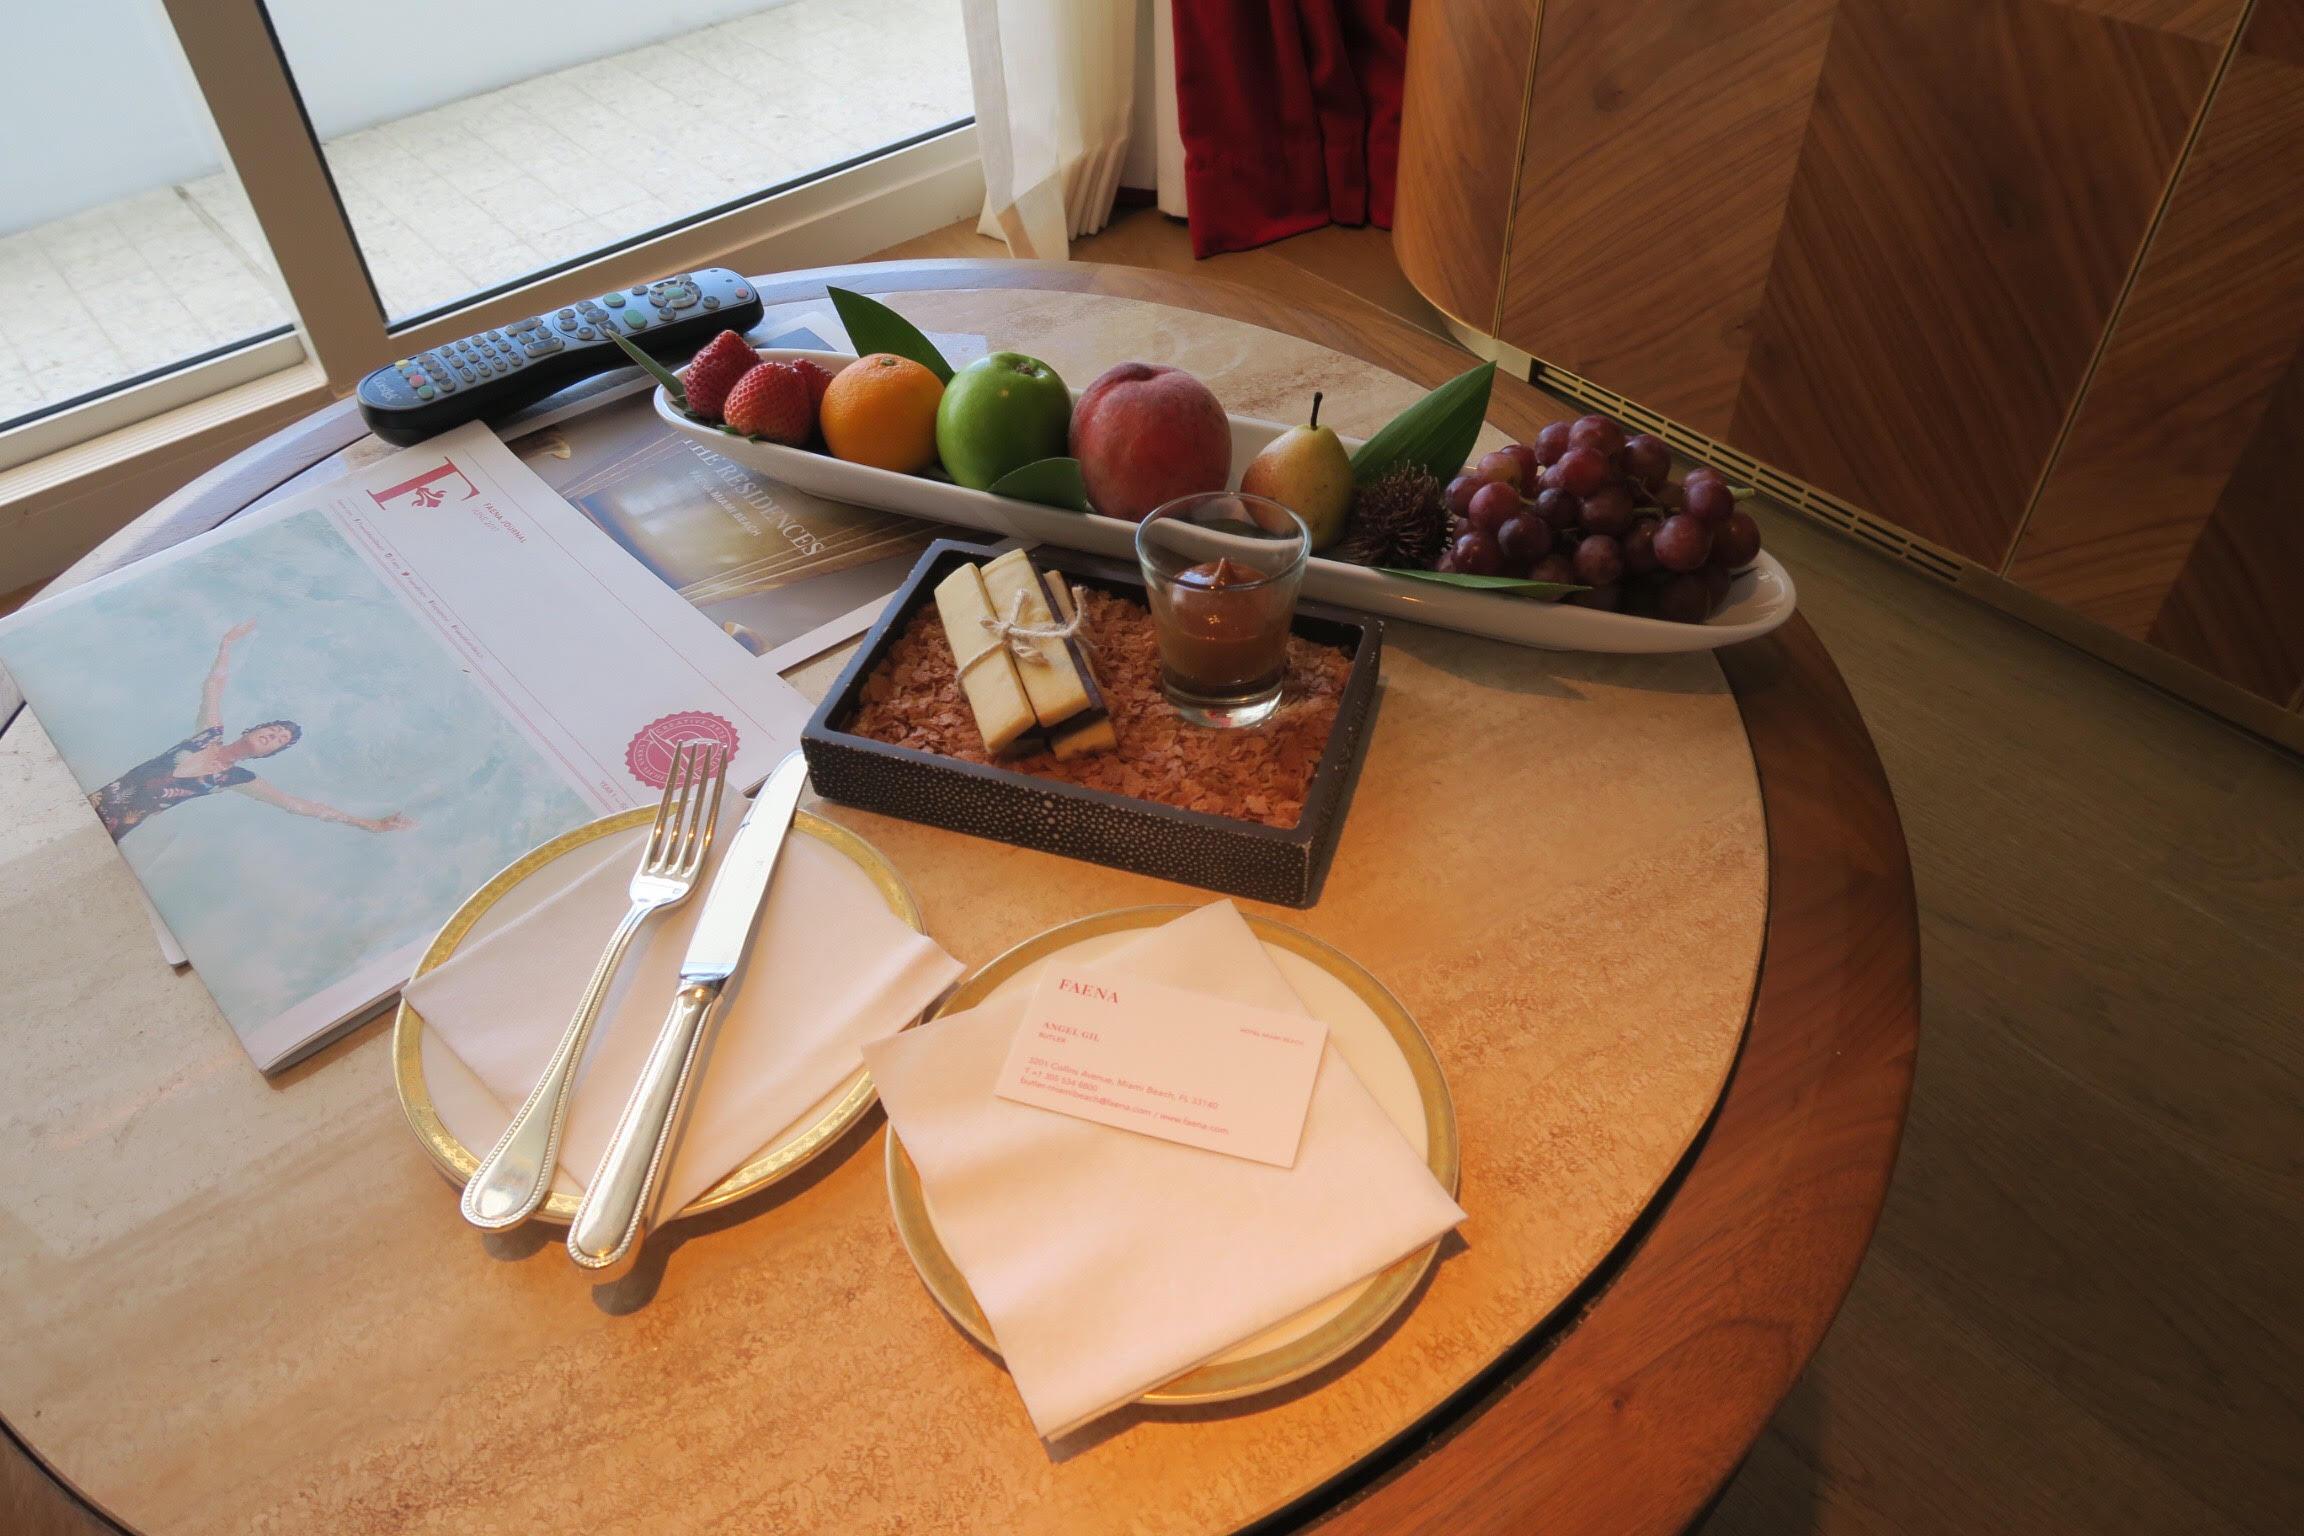 luxury + platter + plate of fruit + bowl + faena hotel + fine dining + good service + review + blog .jpg